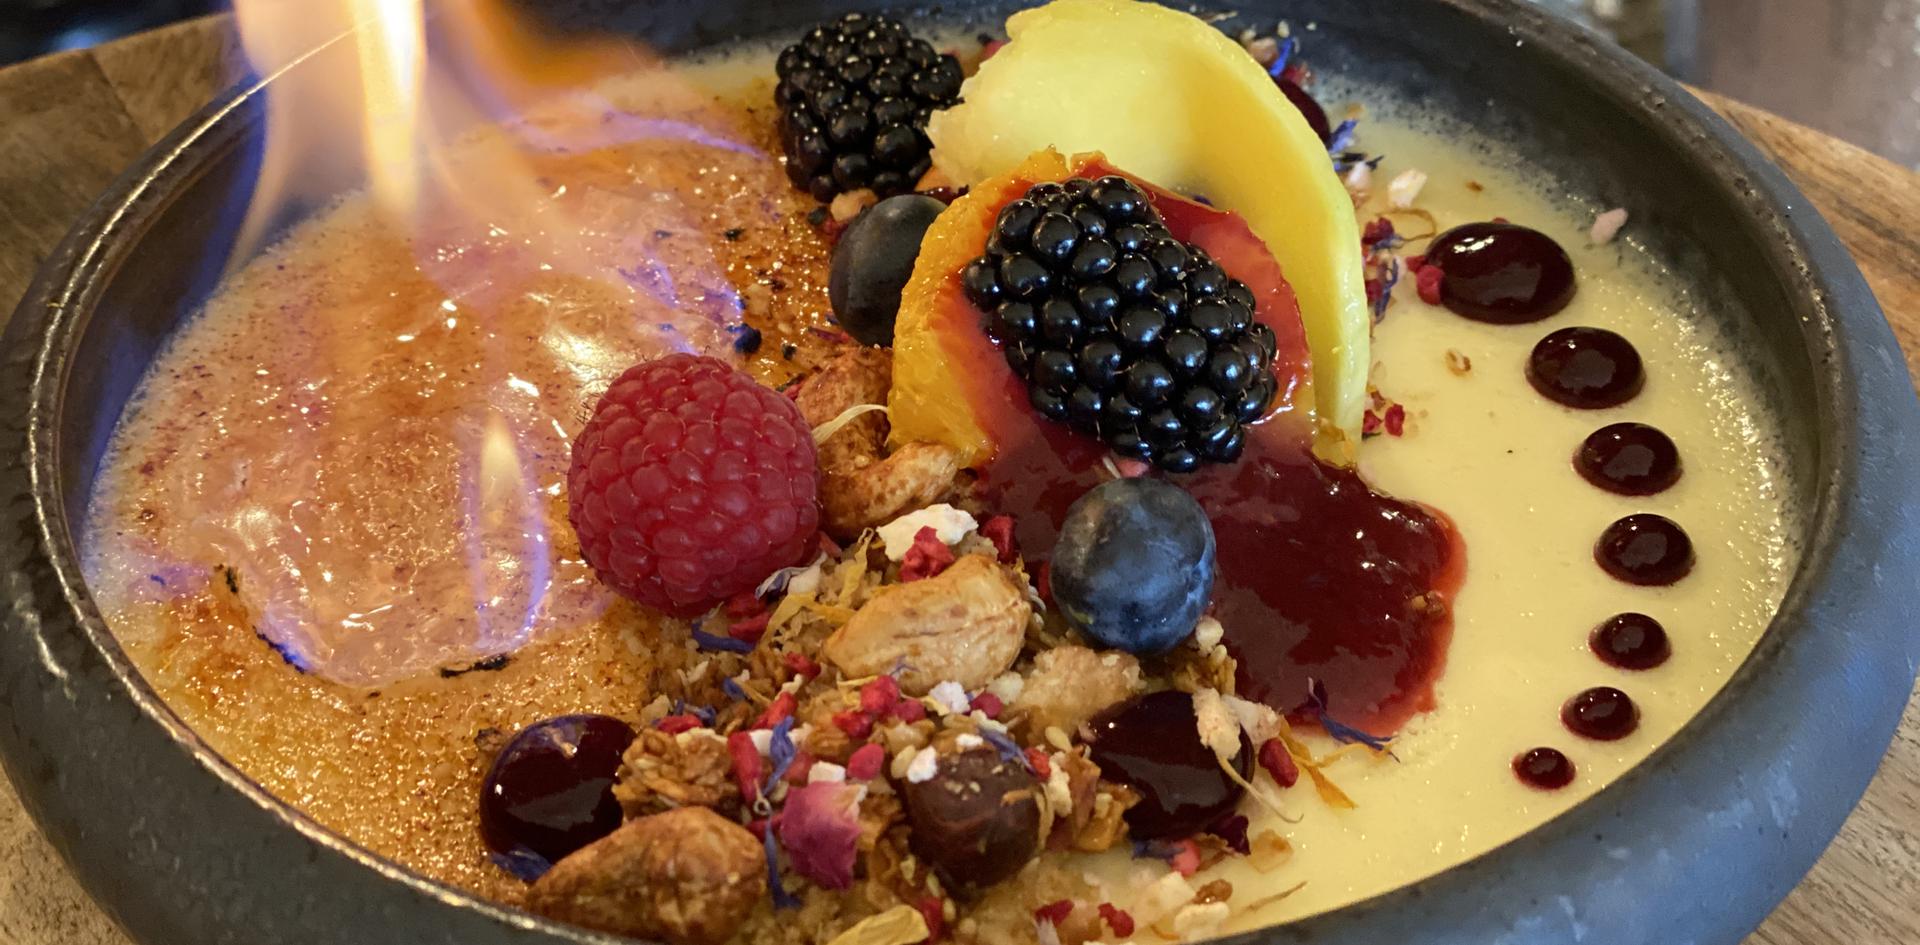 Dessert Restaurant Dinner - Hotel Wegner - The culinary Art Hotel